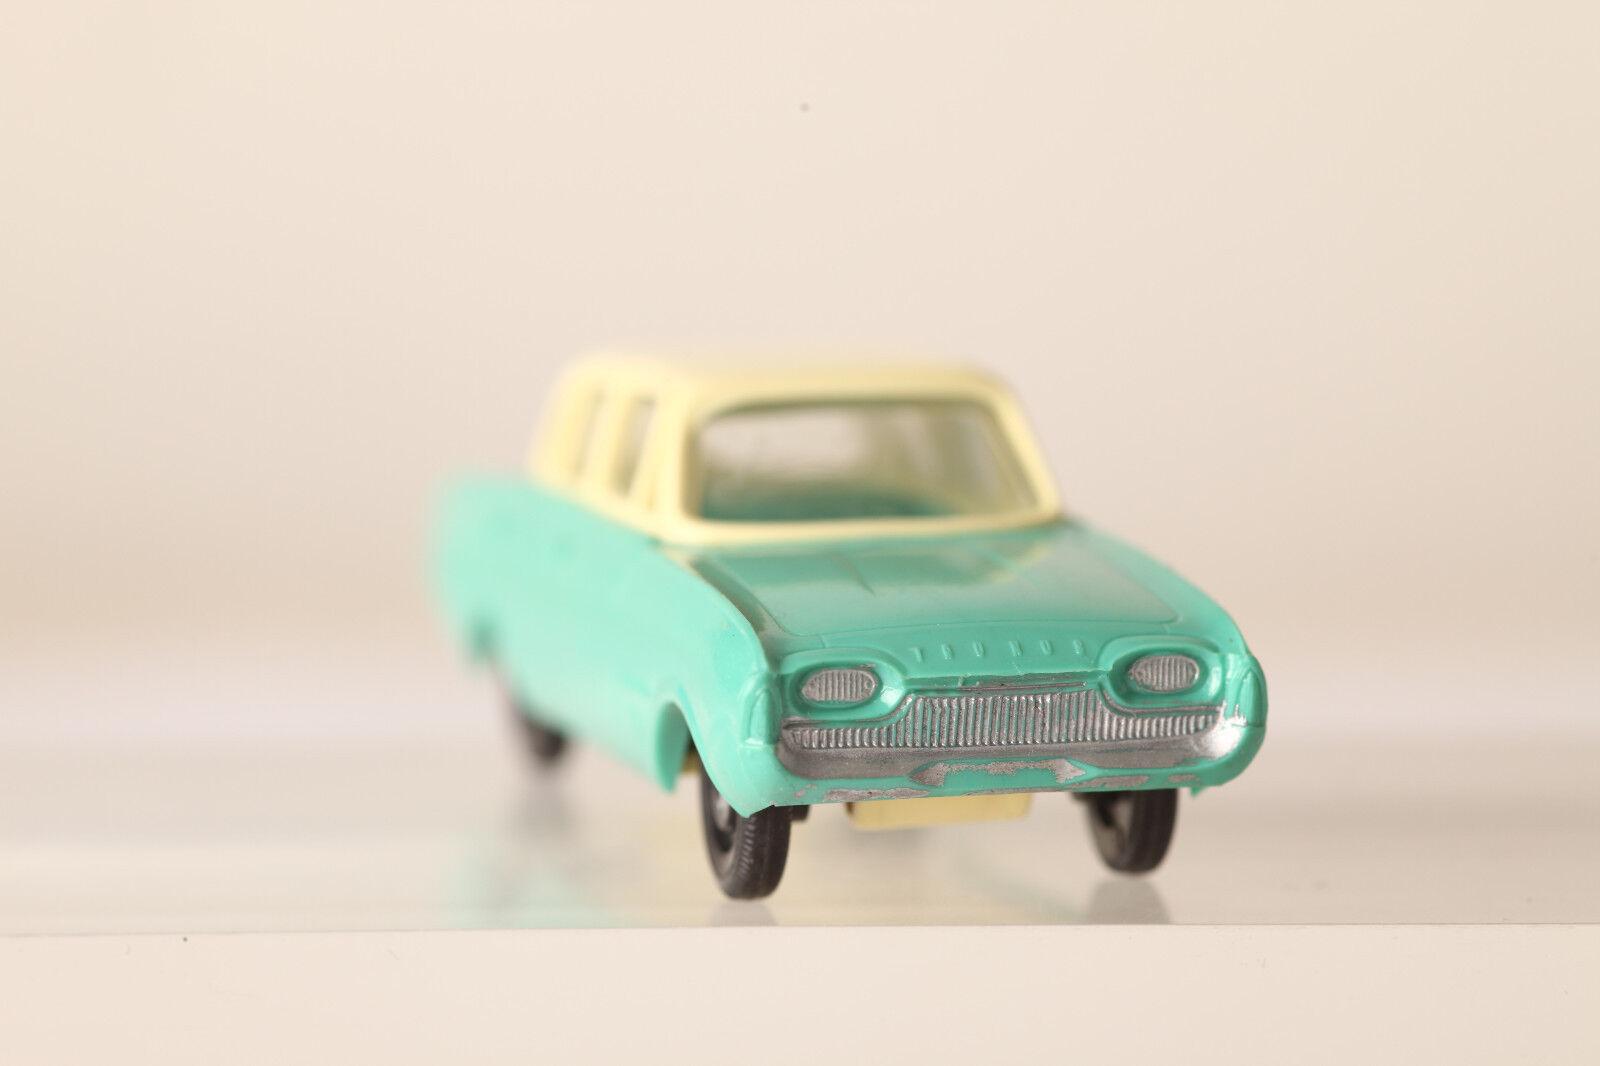 Siku Plastique Ford 17 M Baignoire 1960 V172 Beige Vert Clair Clair